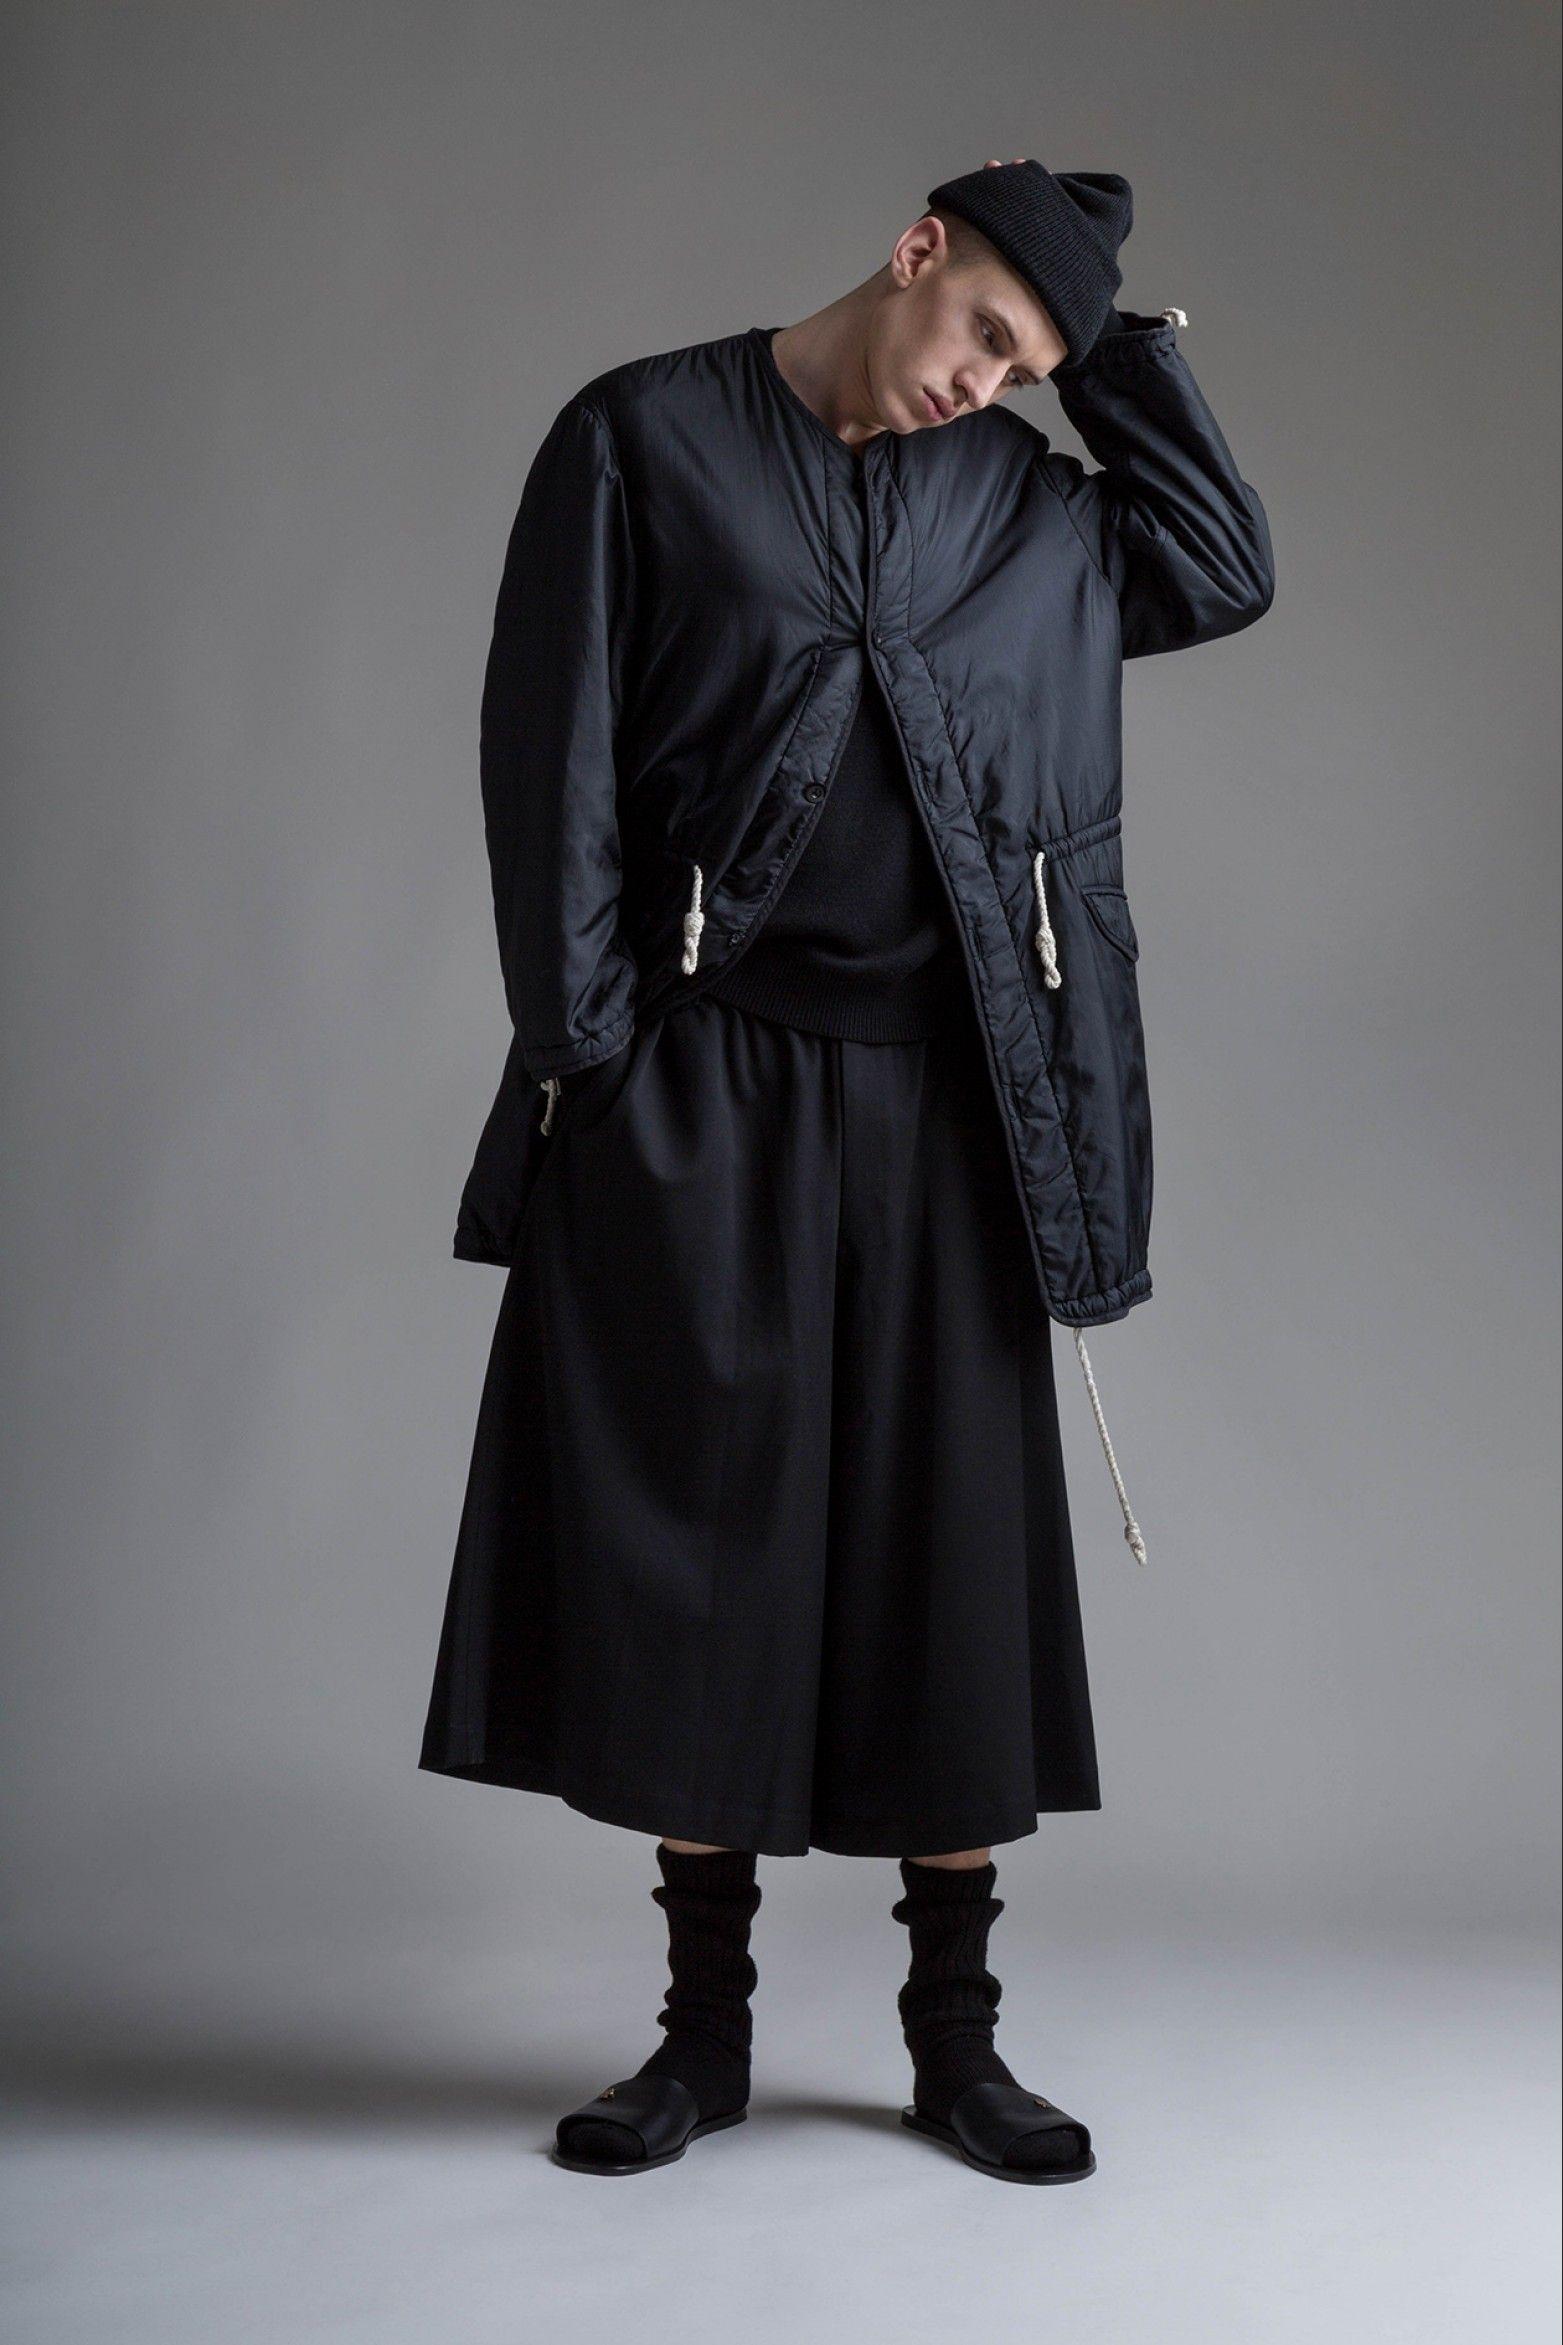 Vintage Yohji Yamamoto Men s Gauchos   Одежда   Pinterest   Yohji ... 32aa2ea50d7